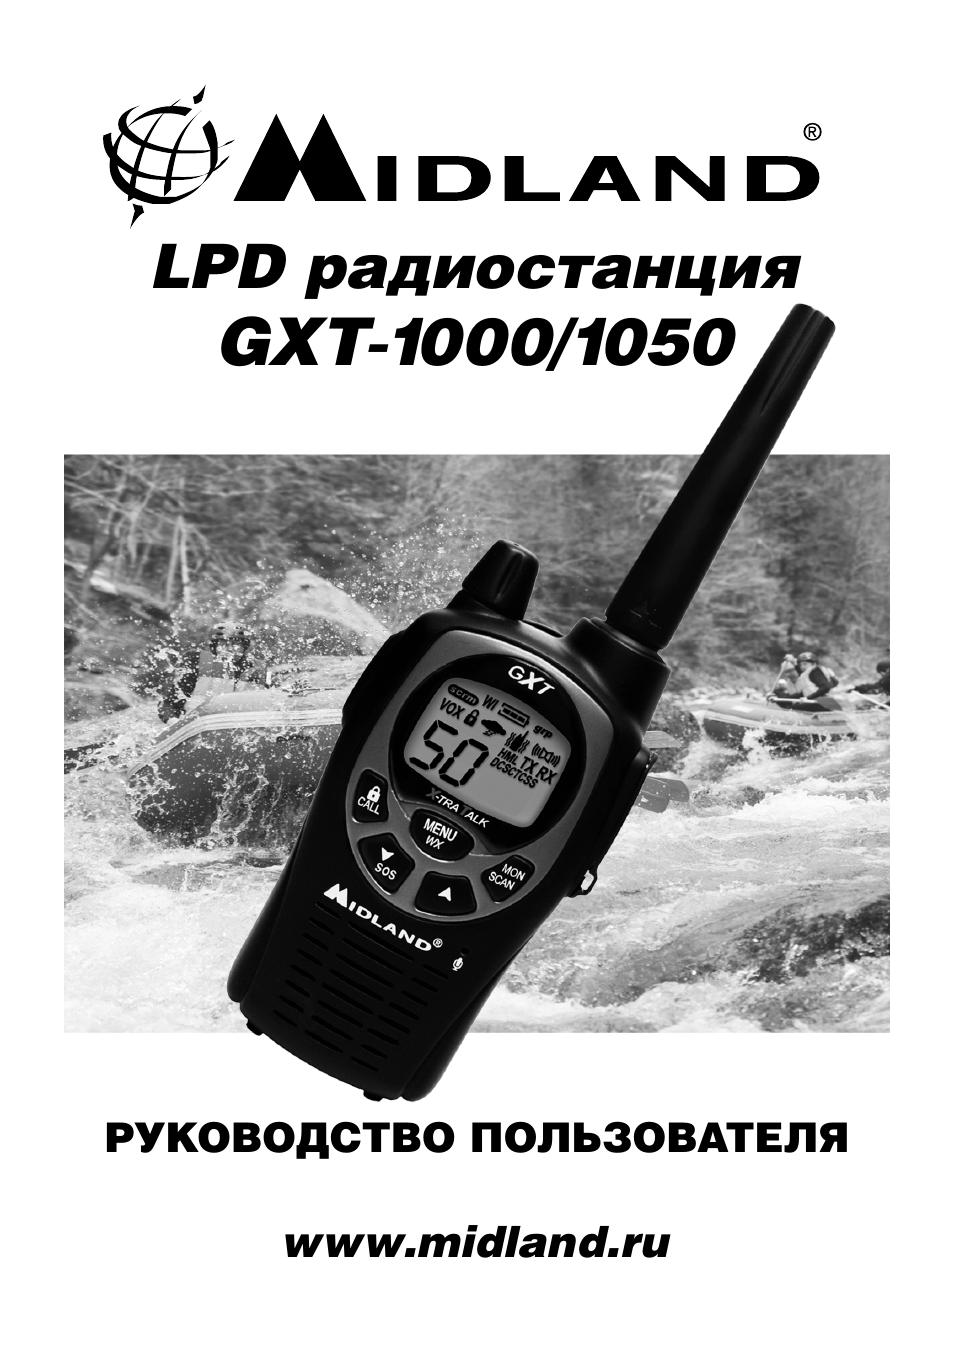 Midland gxt 1000 инструкция